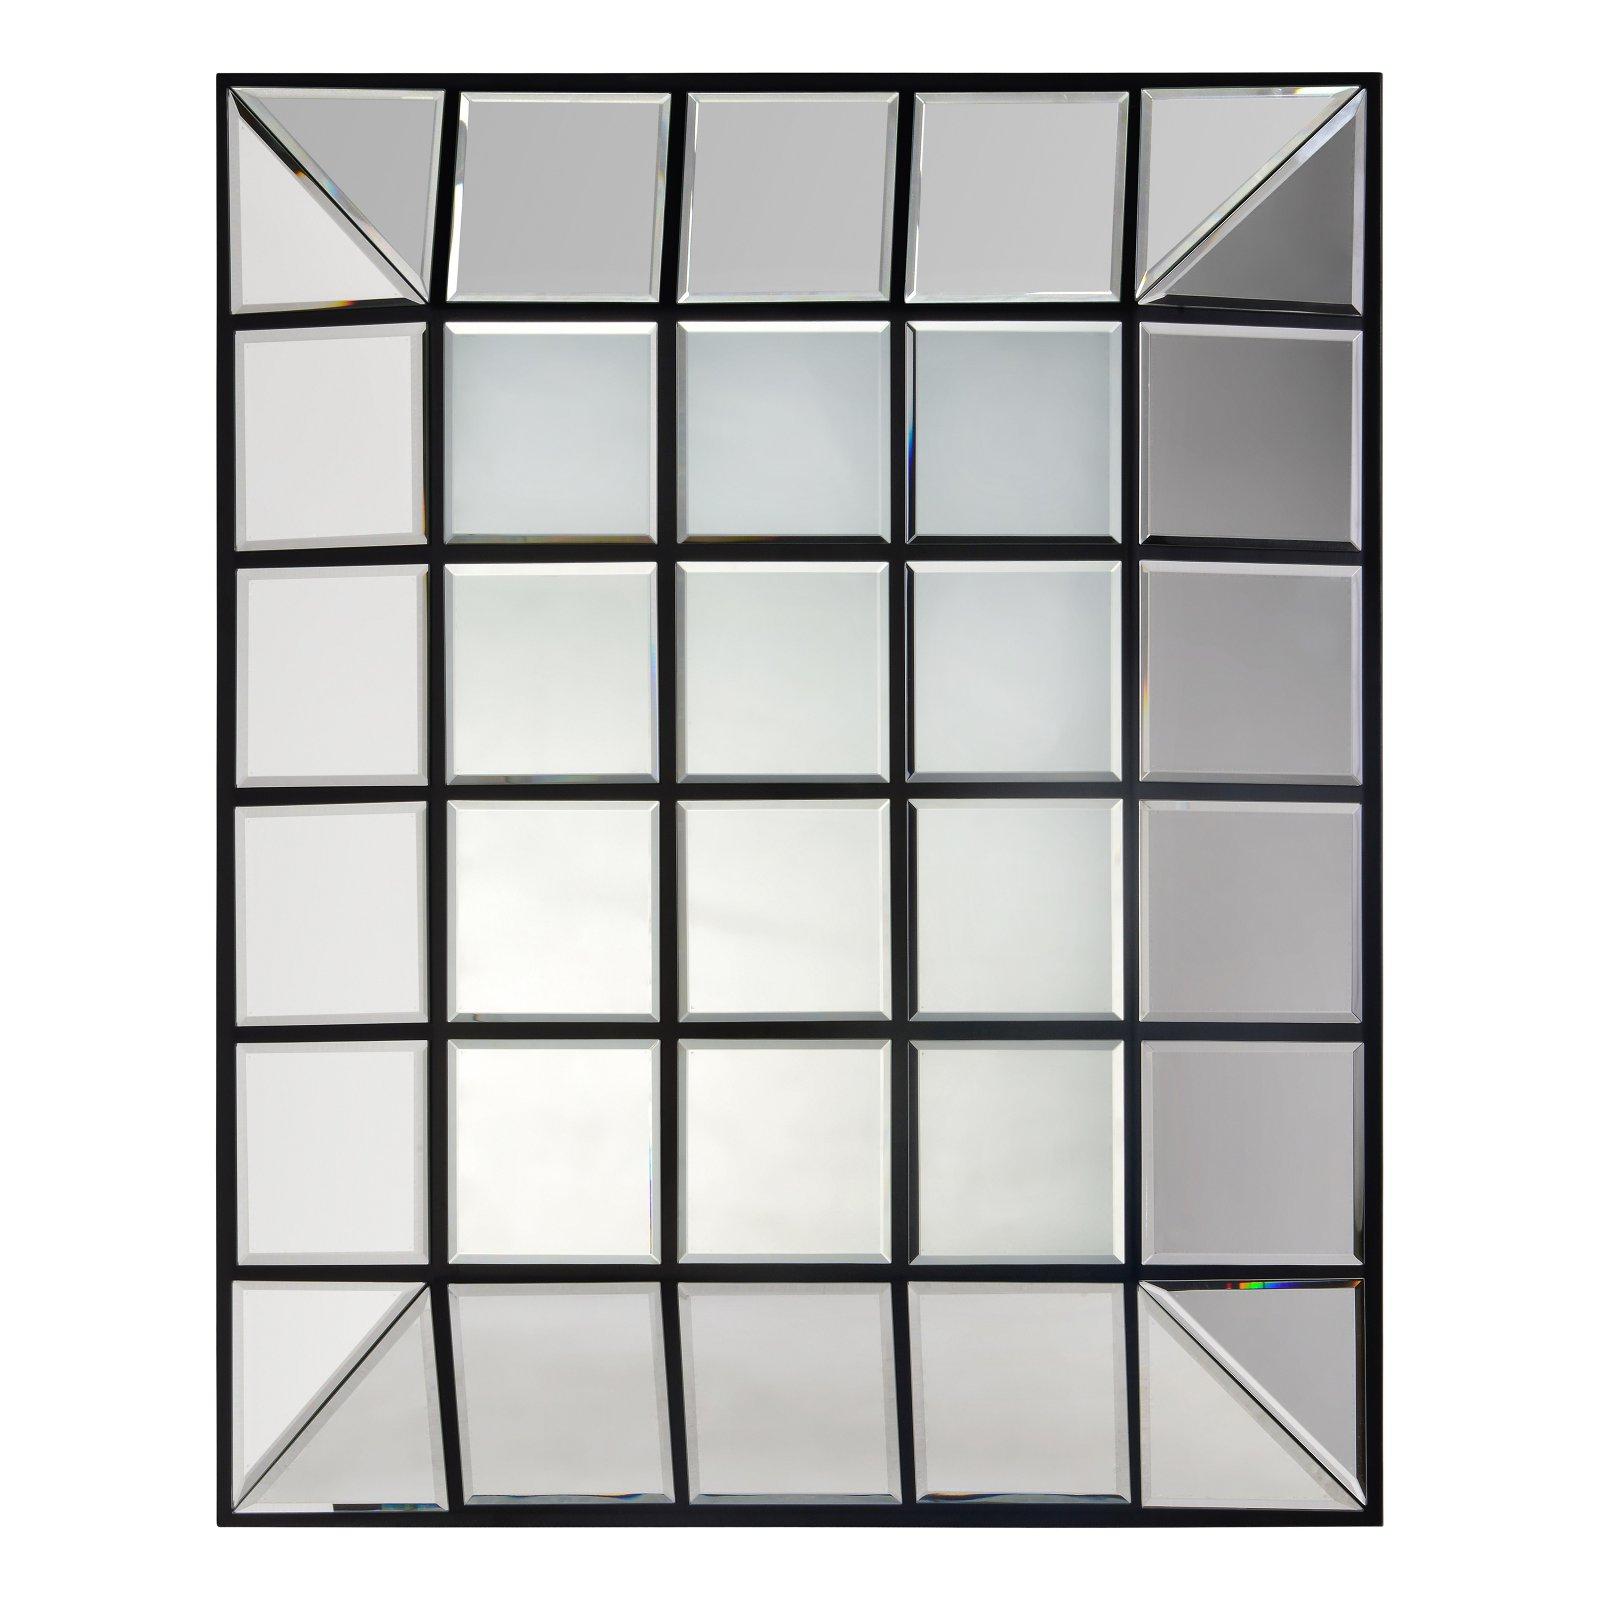 Mirror Regarding Pennsburg Rectangle Wall Mirror (View 8 of 20)